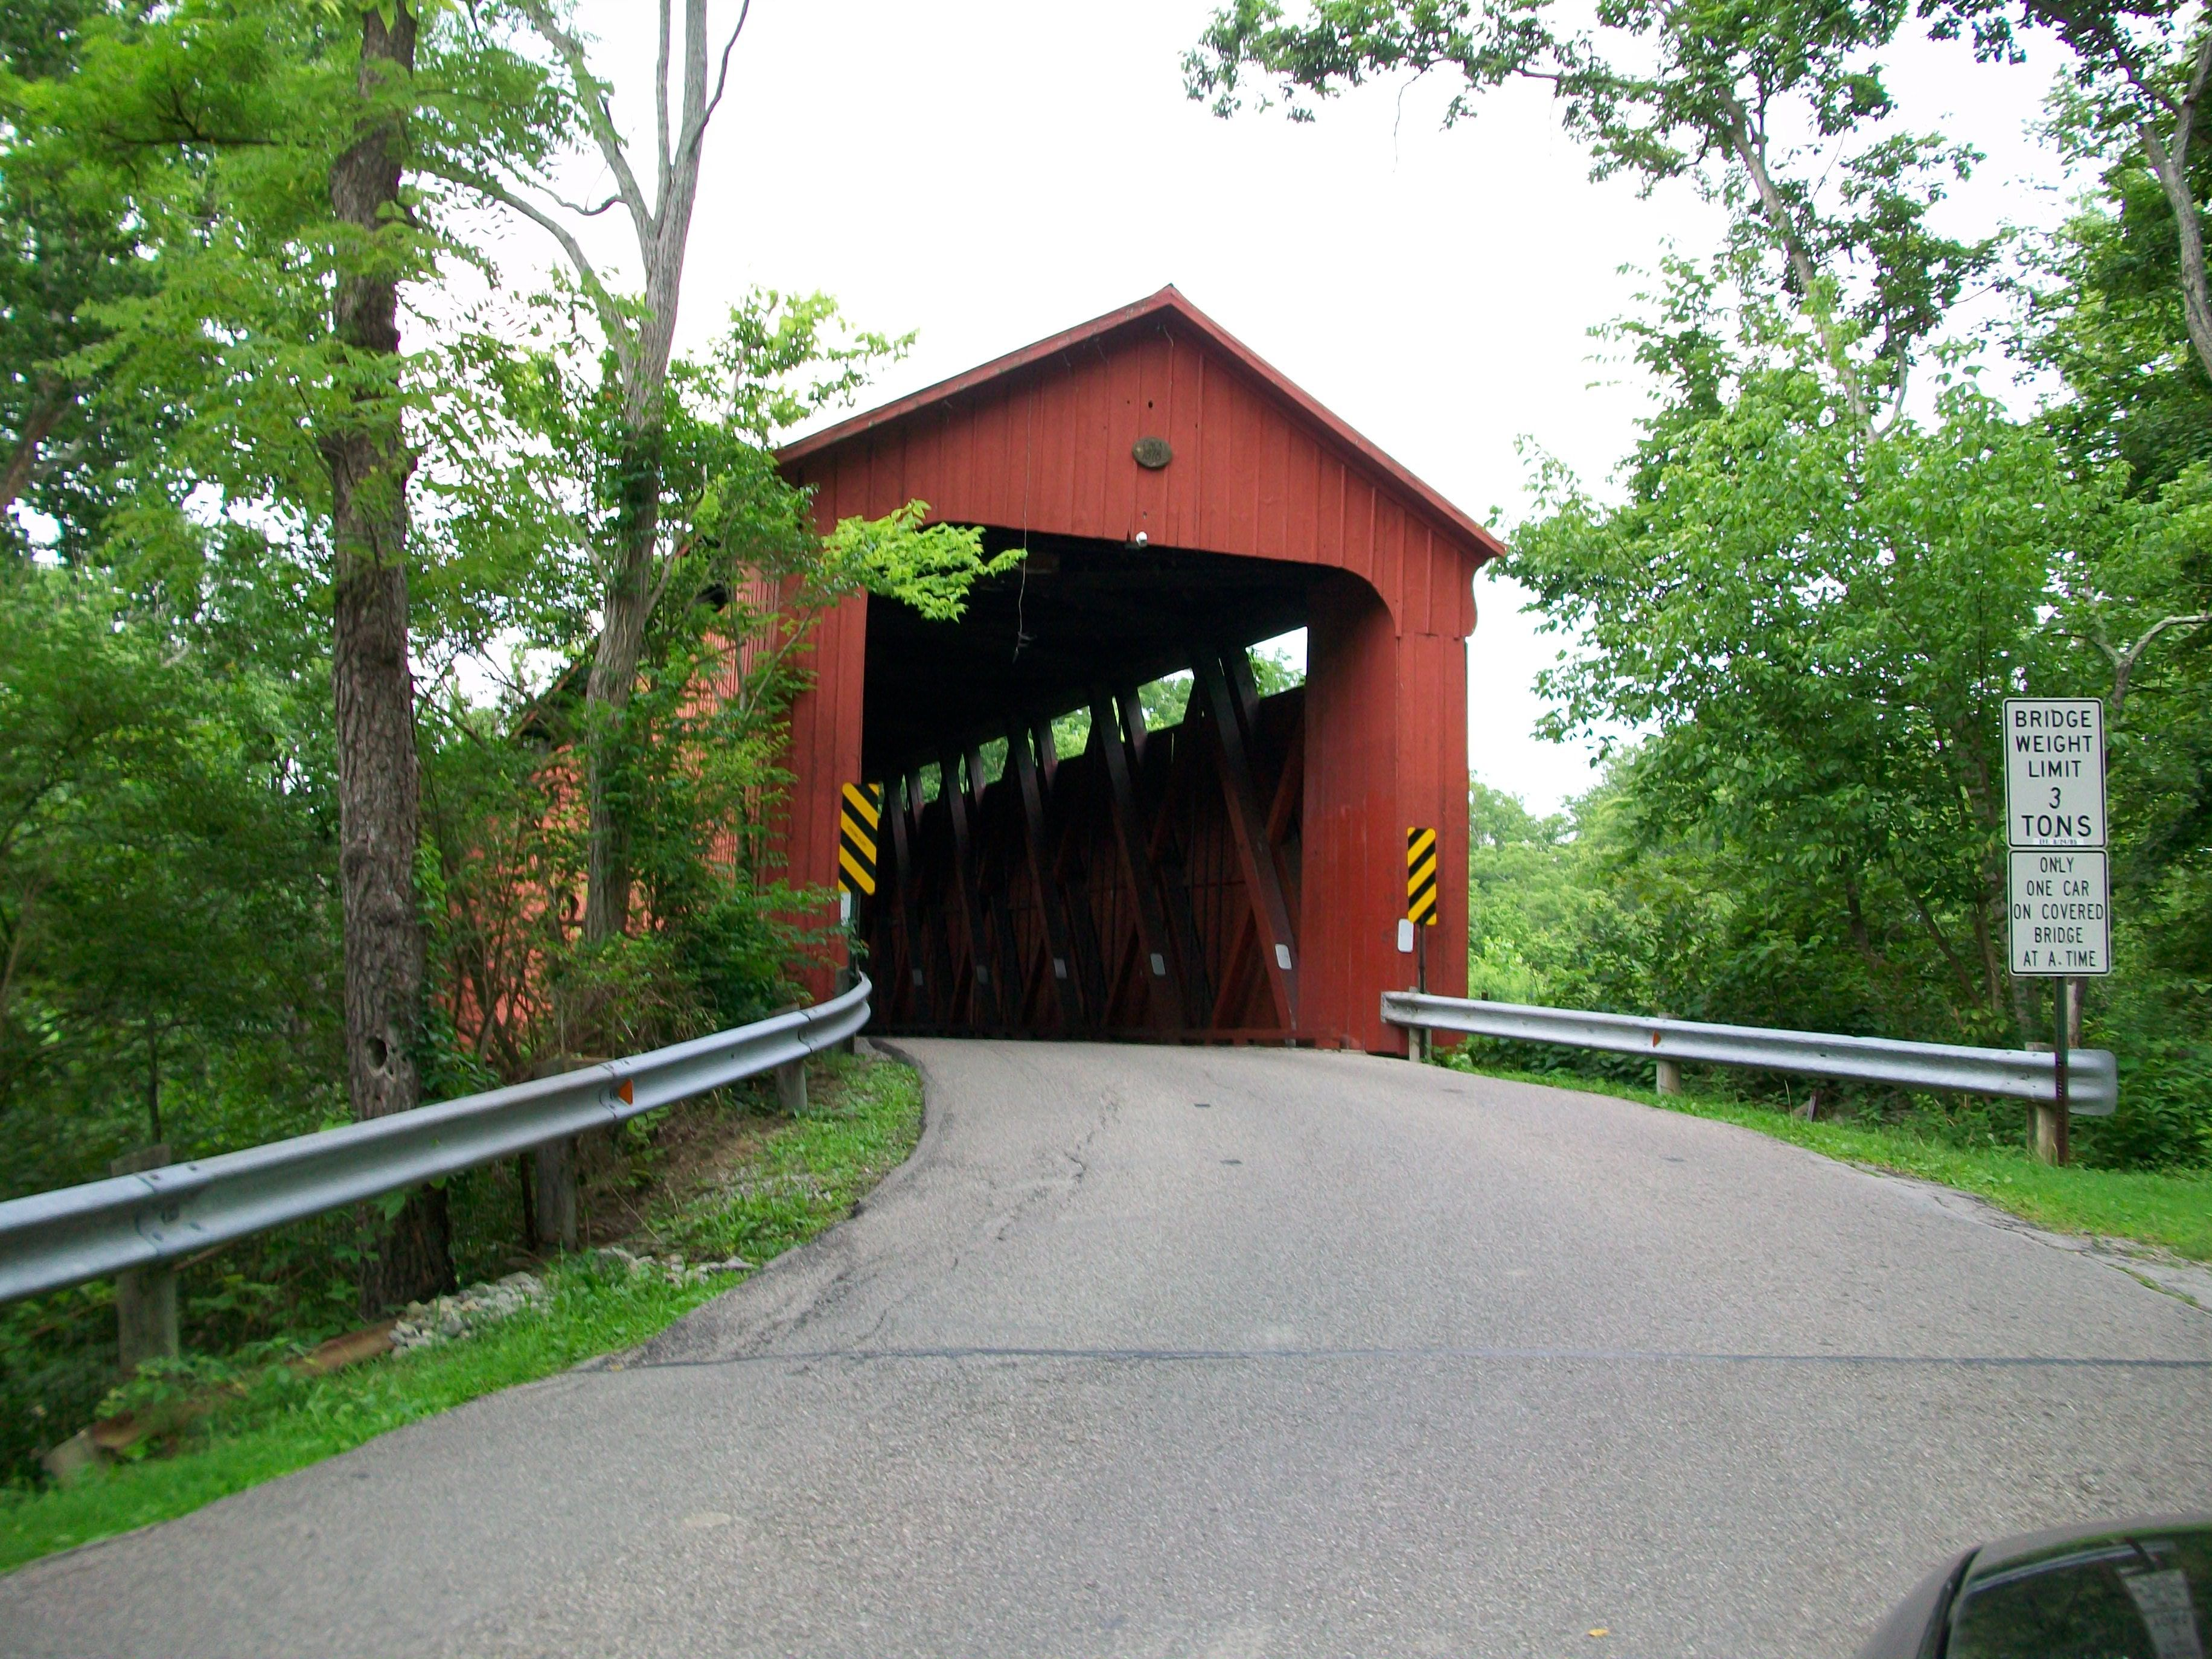 Haunting lick road, free amateur voyeur videos